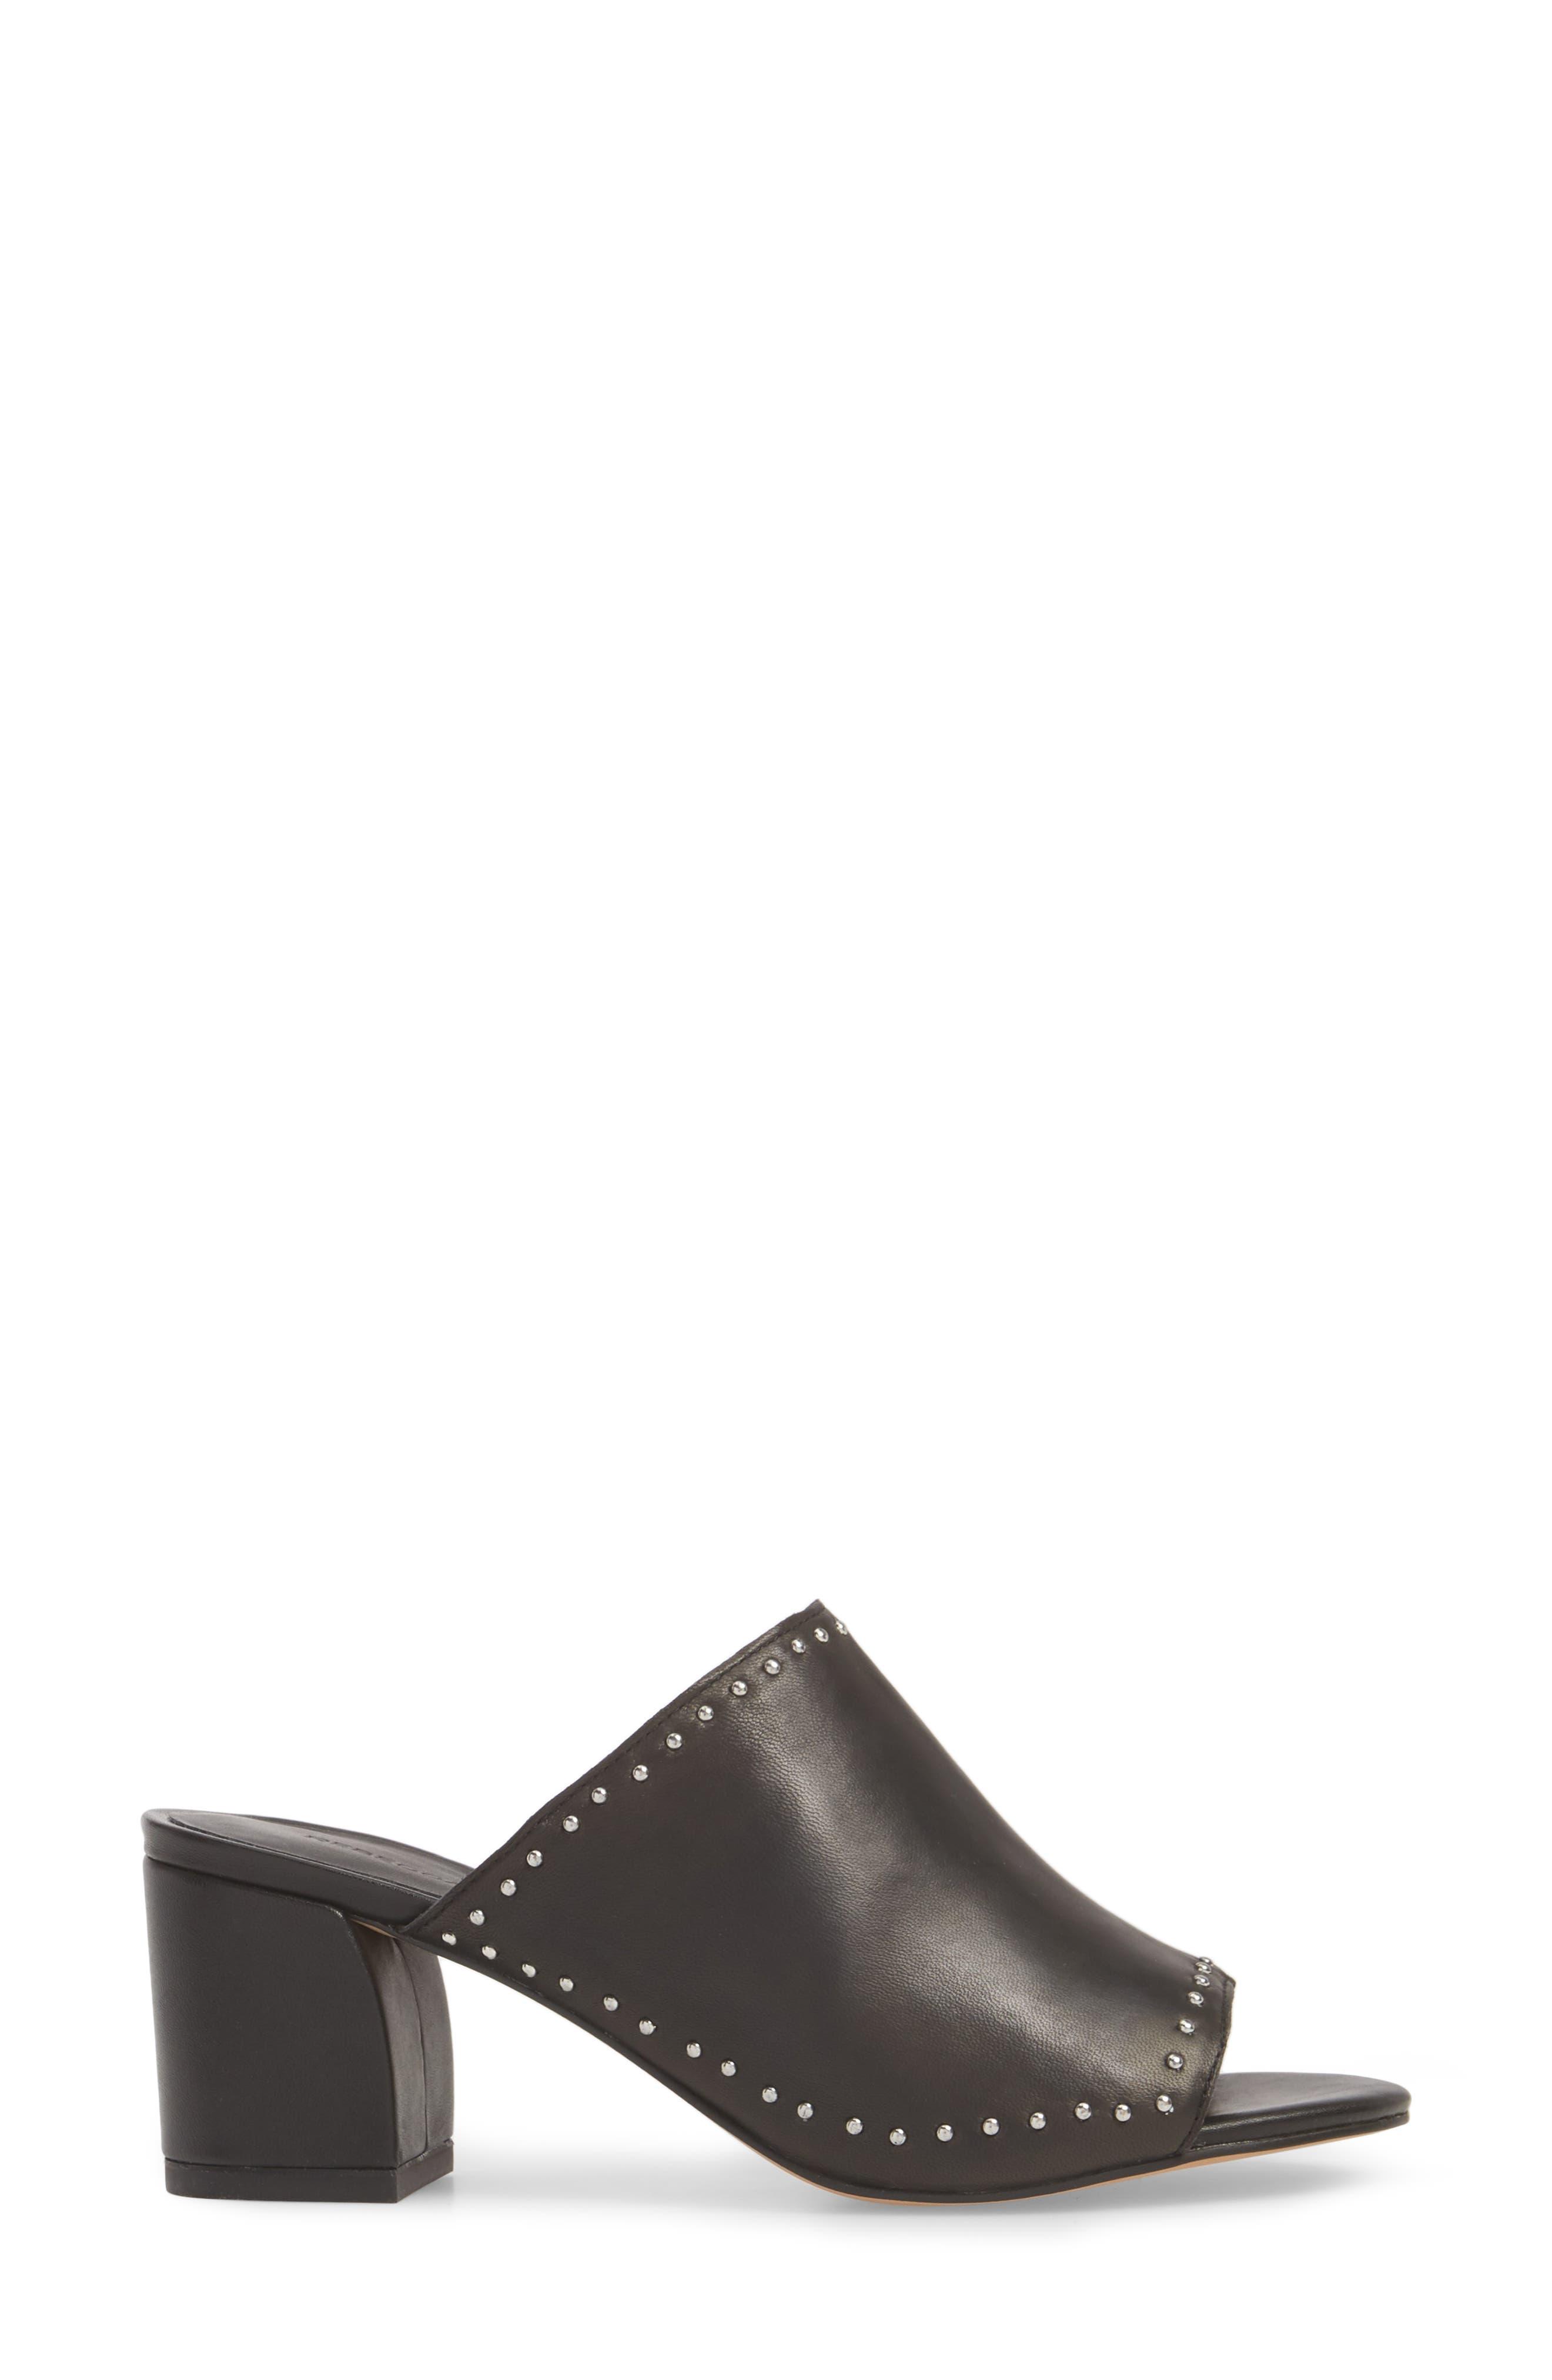 Lainy Studded Mule,                             Alternate thumbnail 3, color,                             Black Leather